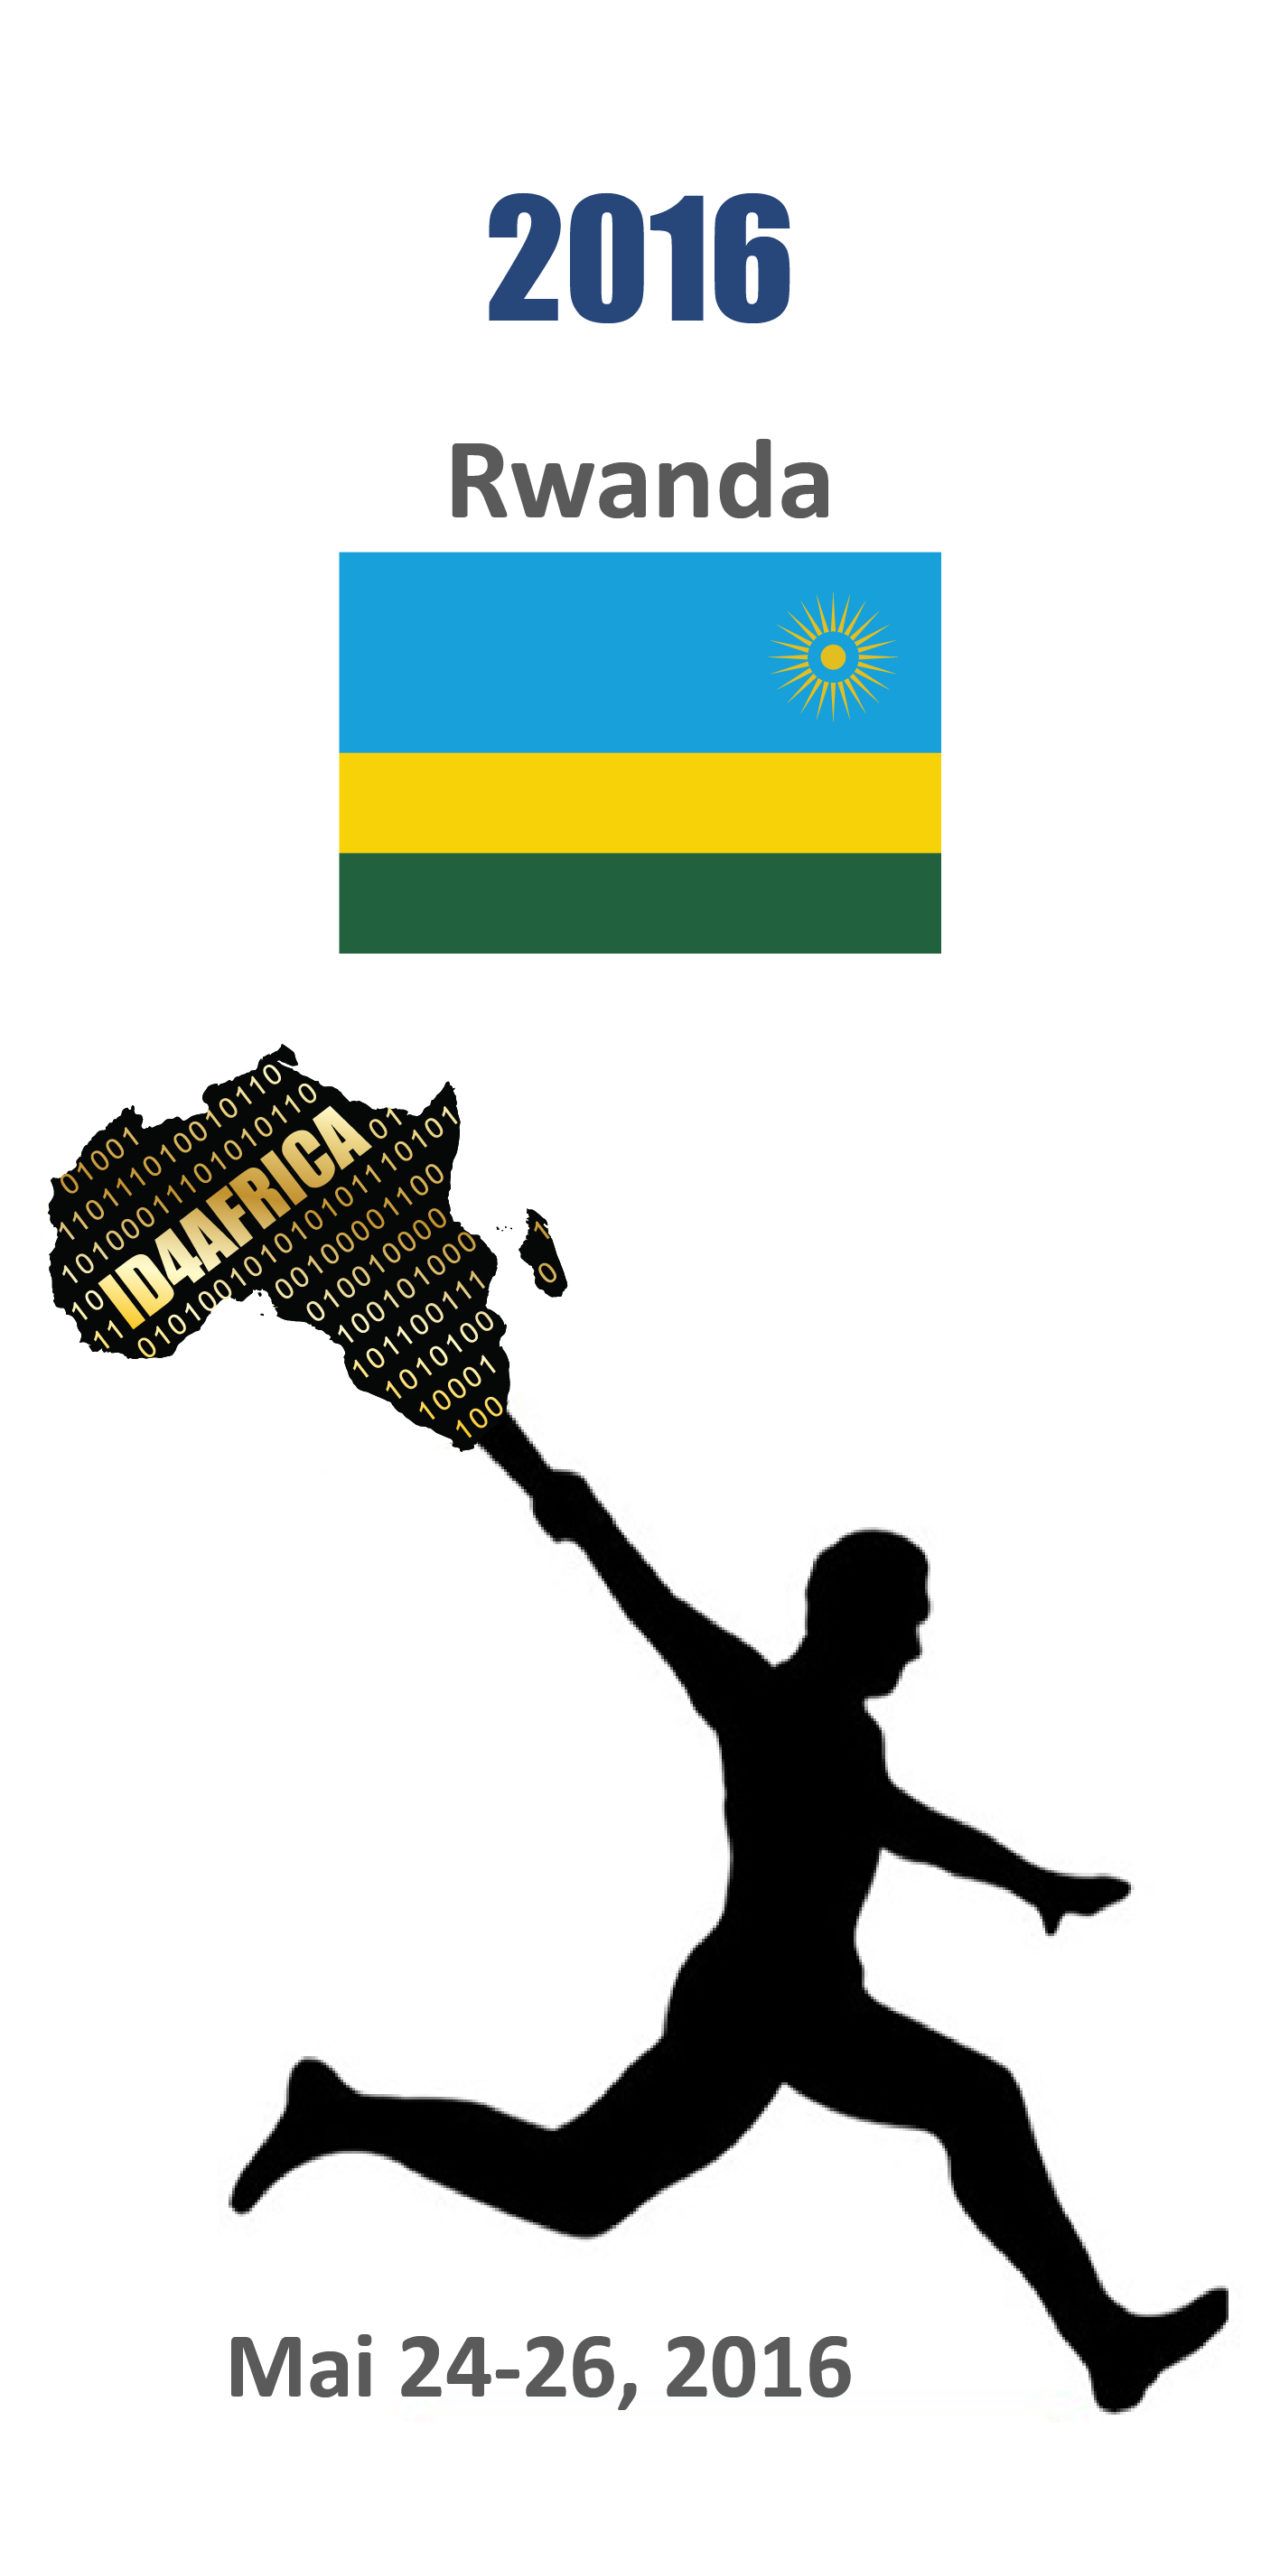 ID4Africa 2016